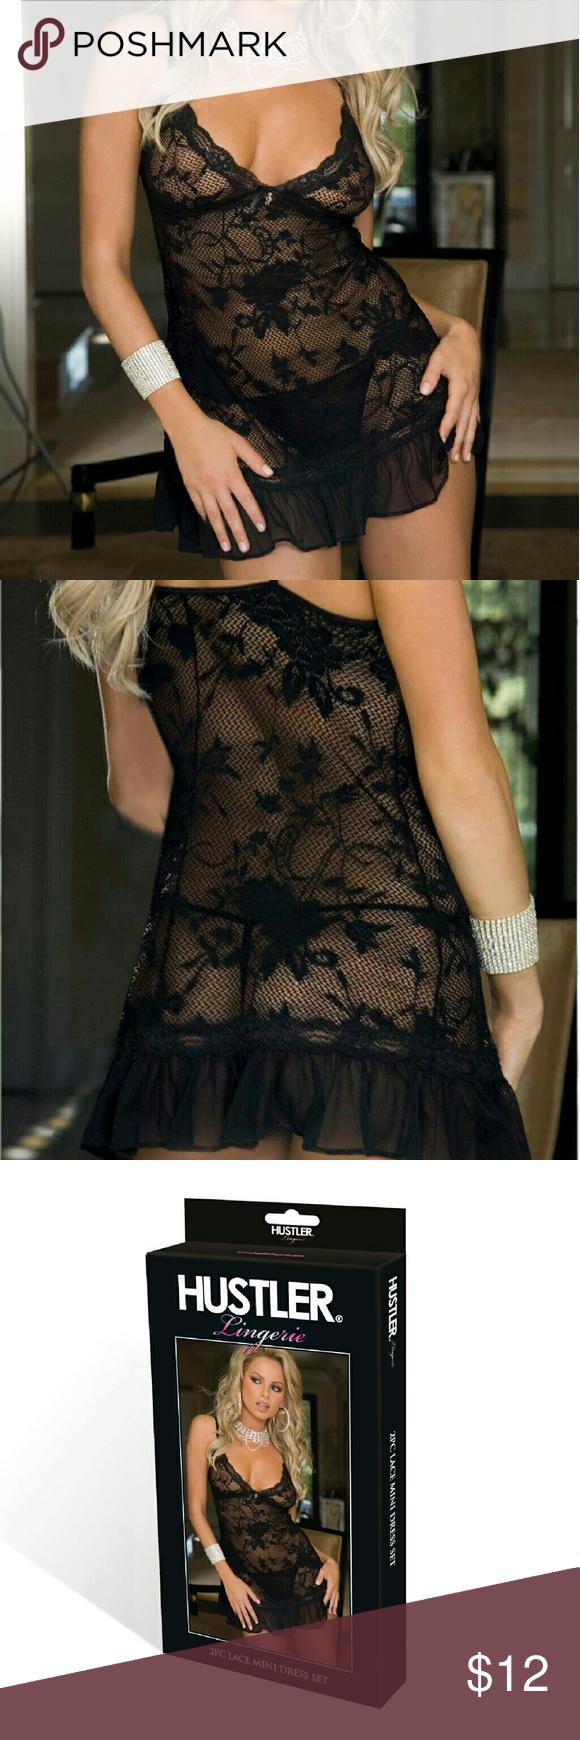 b172f36b2a Hustler Lingeries 2PC Black Lace Mini Dress Set. Classic design hustler  style - this slinky